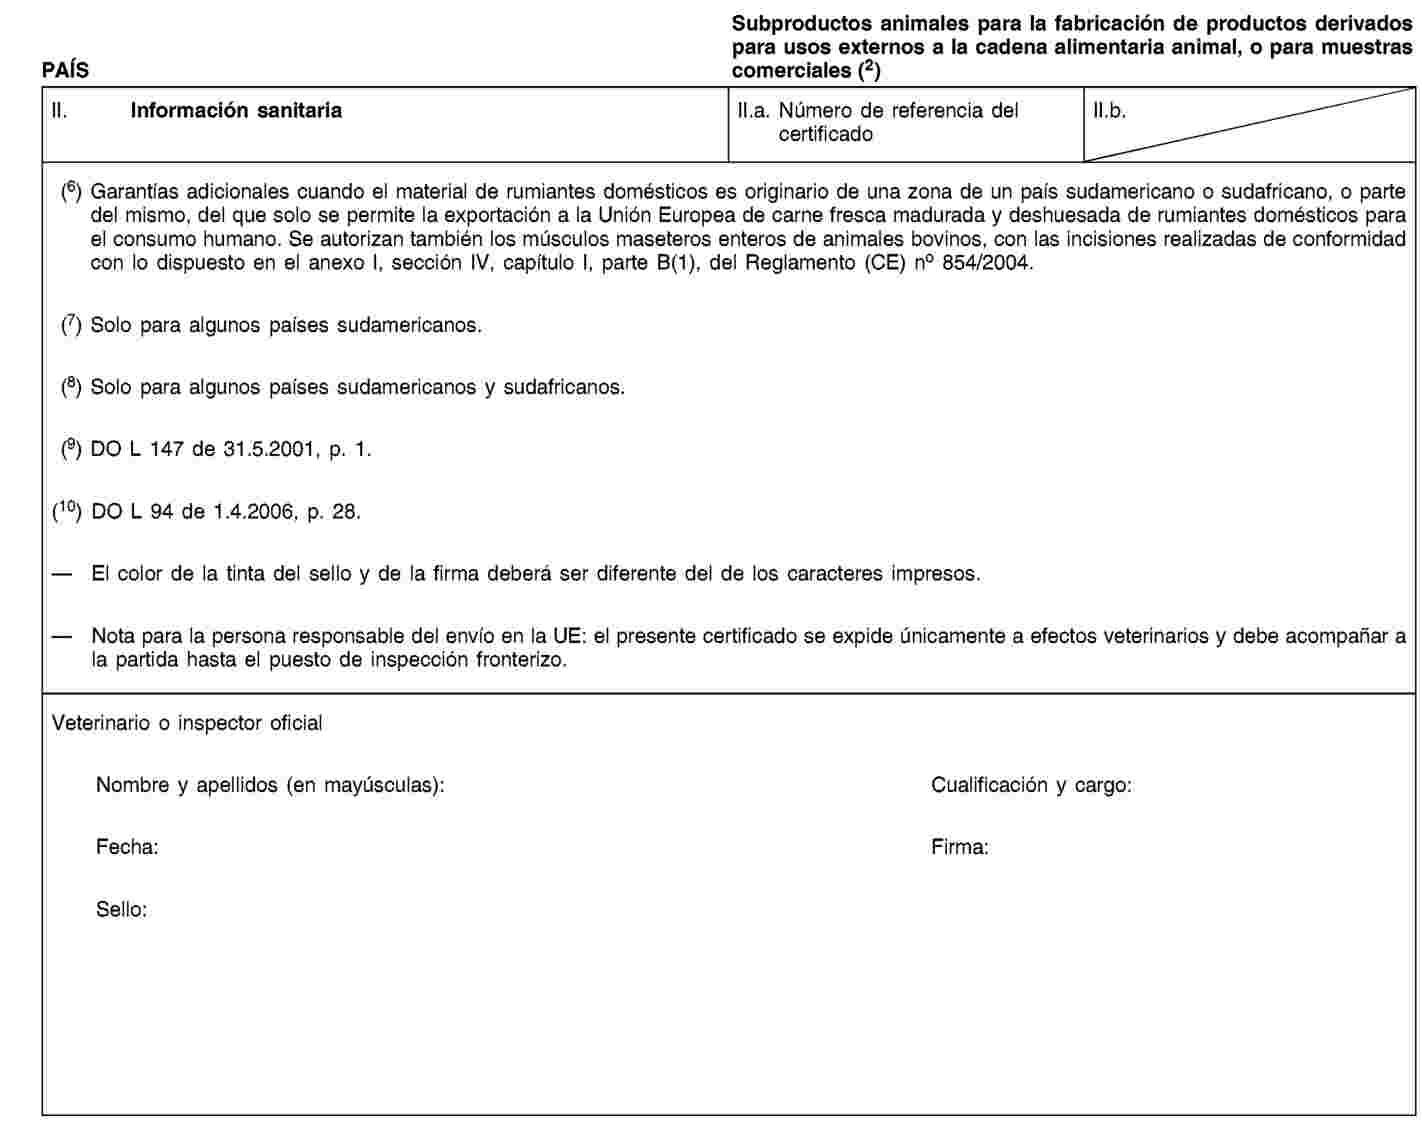 Imagen: https://eur-lex.europa.eu/resource.html?uri=uriserv:OJ.L_.2011.054.01.0001.01.SPA.xhtml.L_2011054ES.01020101.tif.jpg